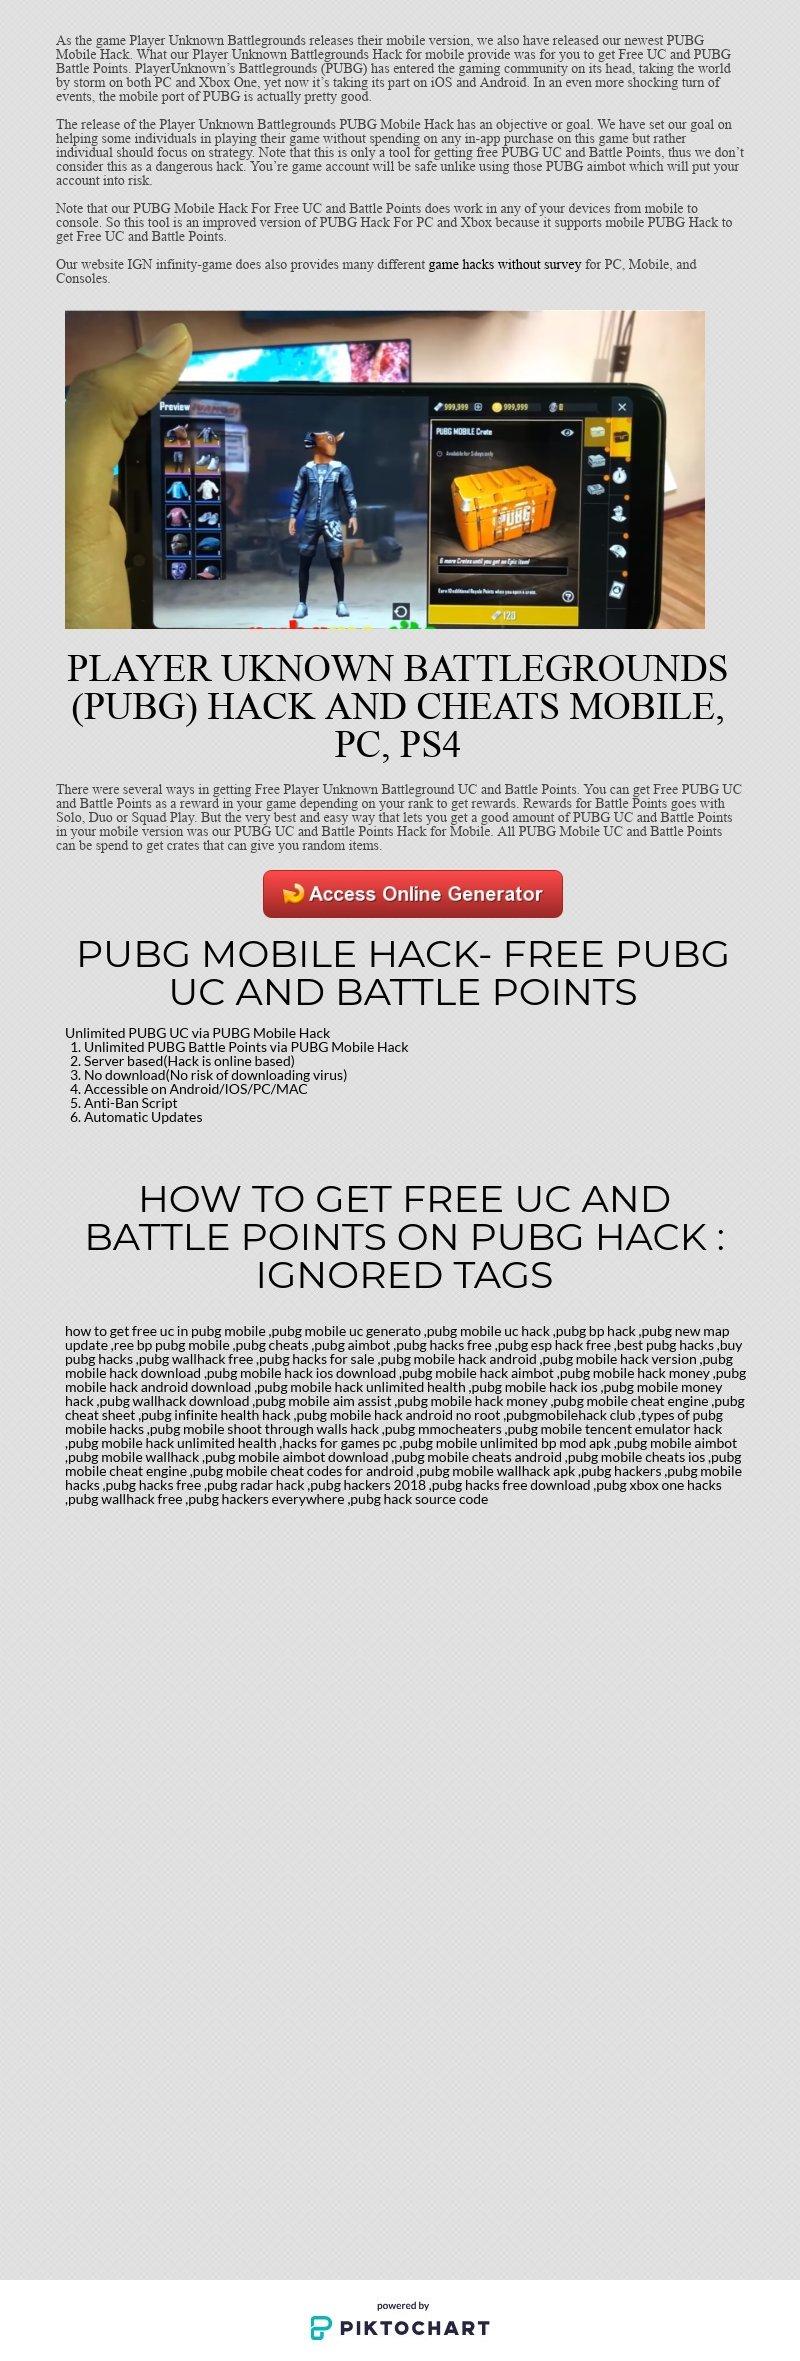 Pubg uc hack | PUBG Mobile UC and BP Hack  2019-03-12